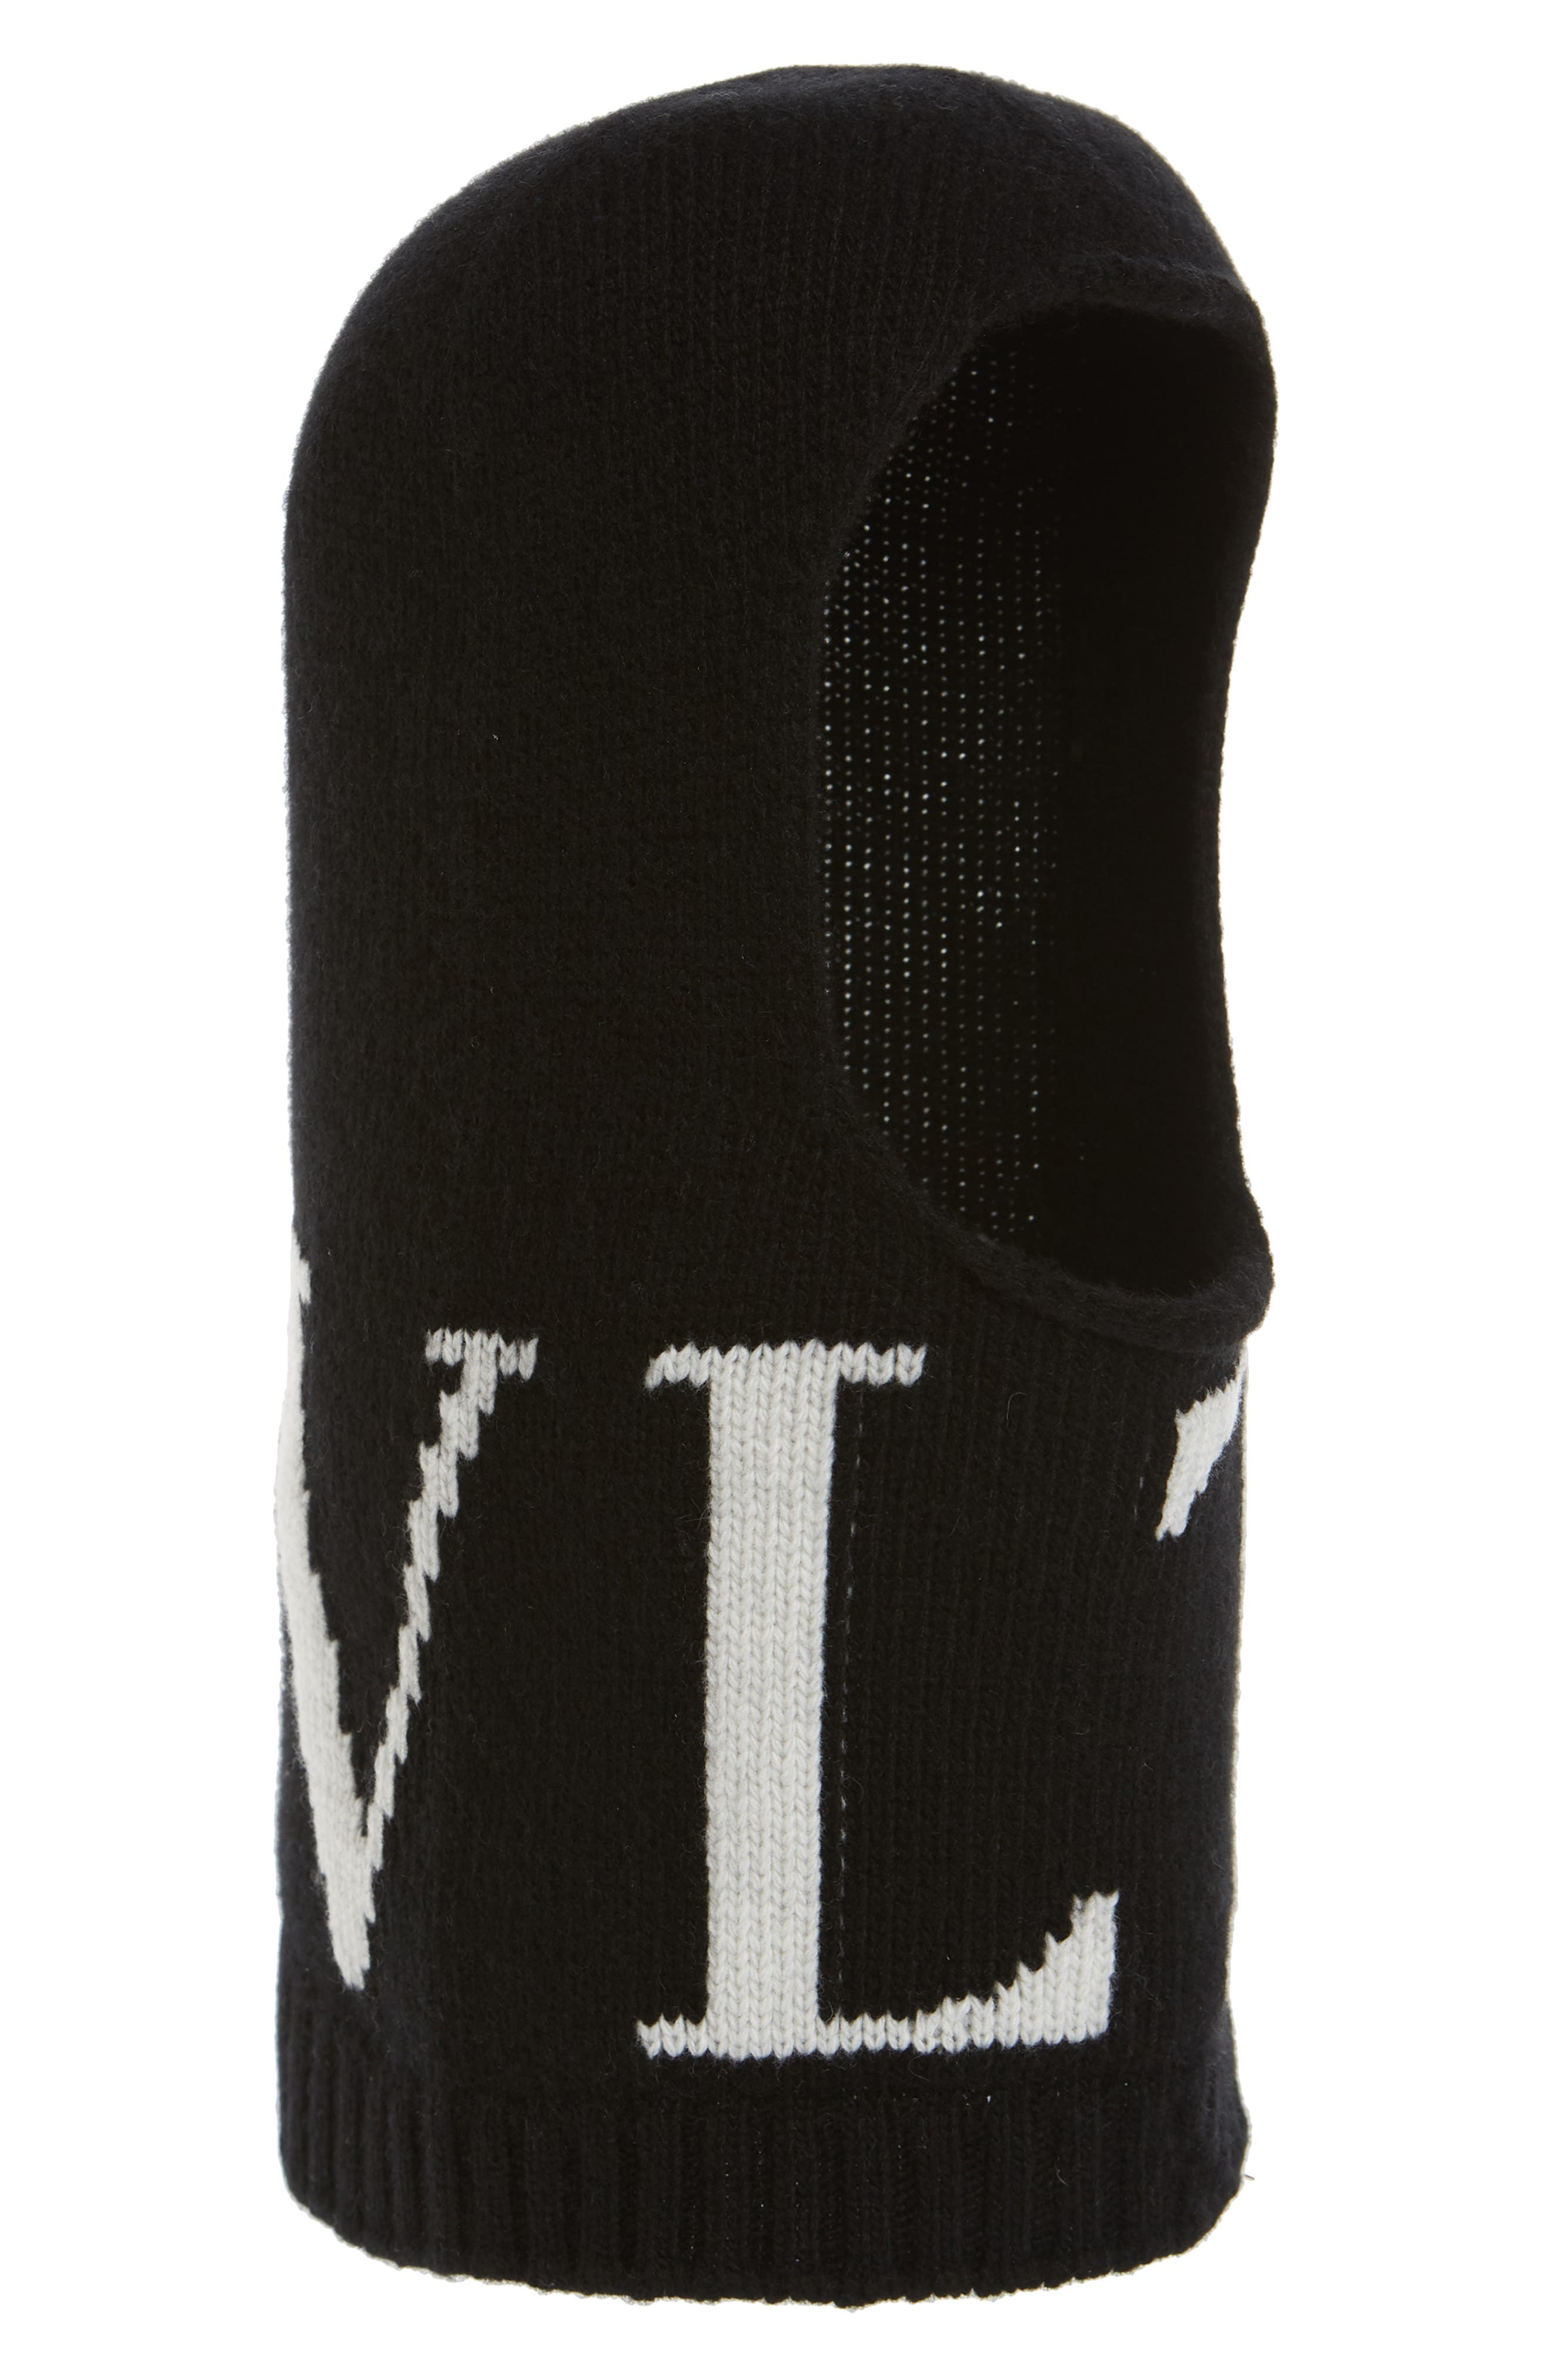 Valentino Vltn Wool & Cashmere Balaclava - Black